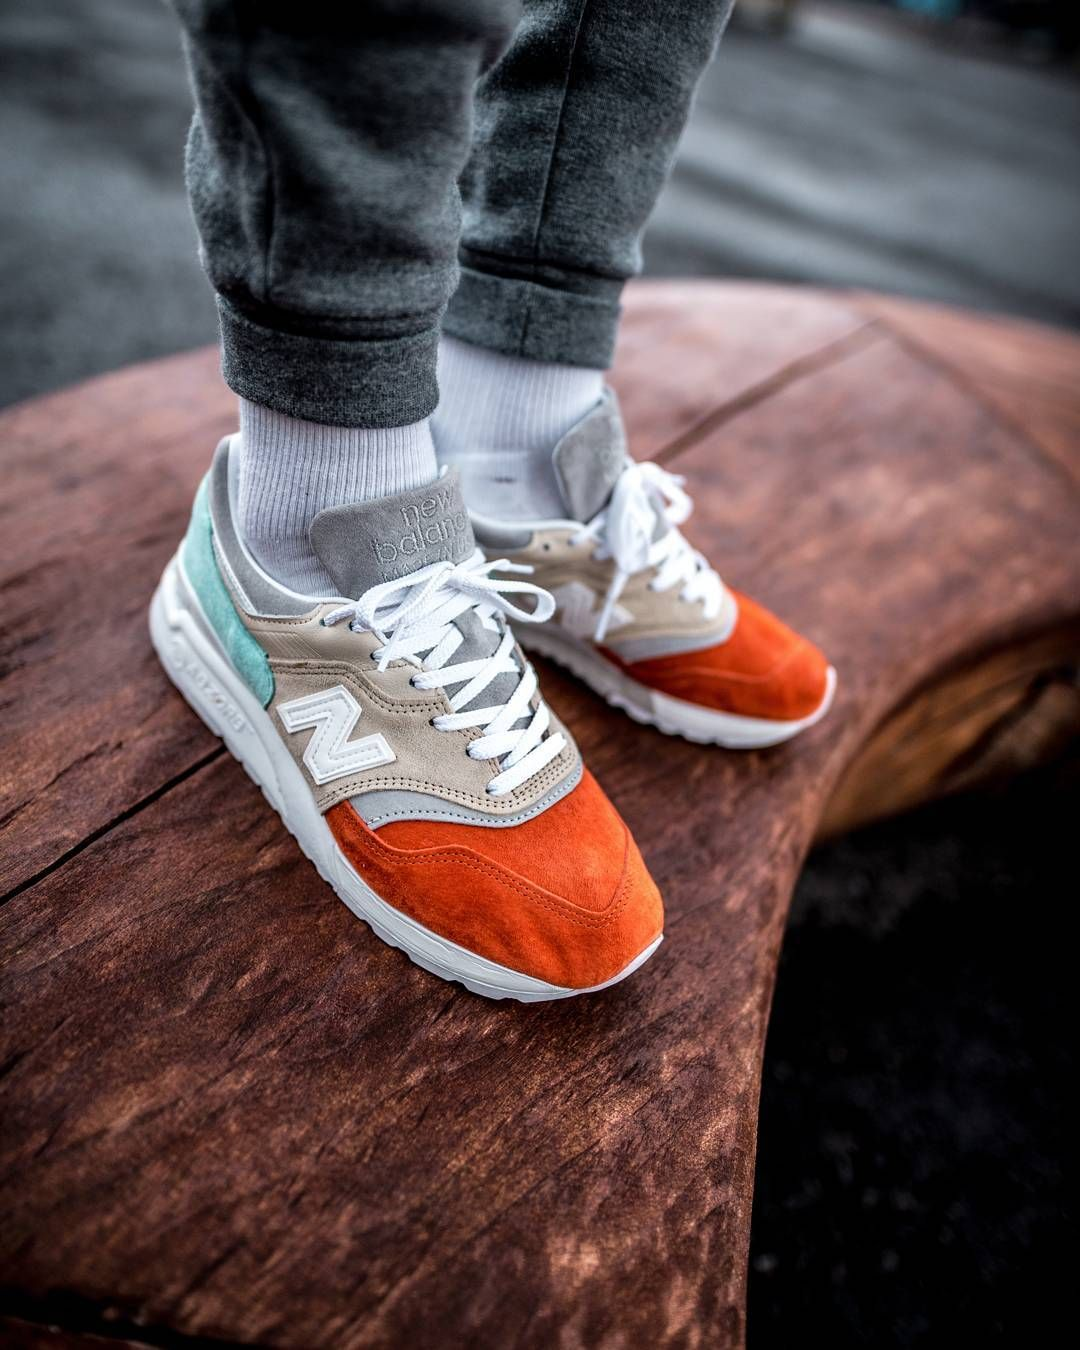 wholesale dealer 9d009 13369 New Balance 997.5 x Ronnie Fieg | Kicks in 2019 | Sneakers ...